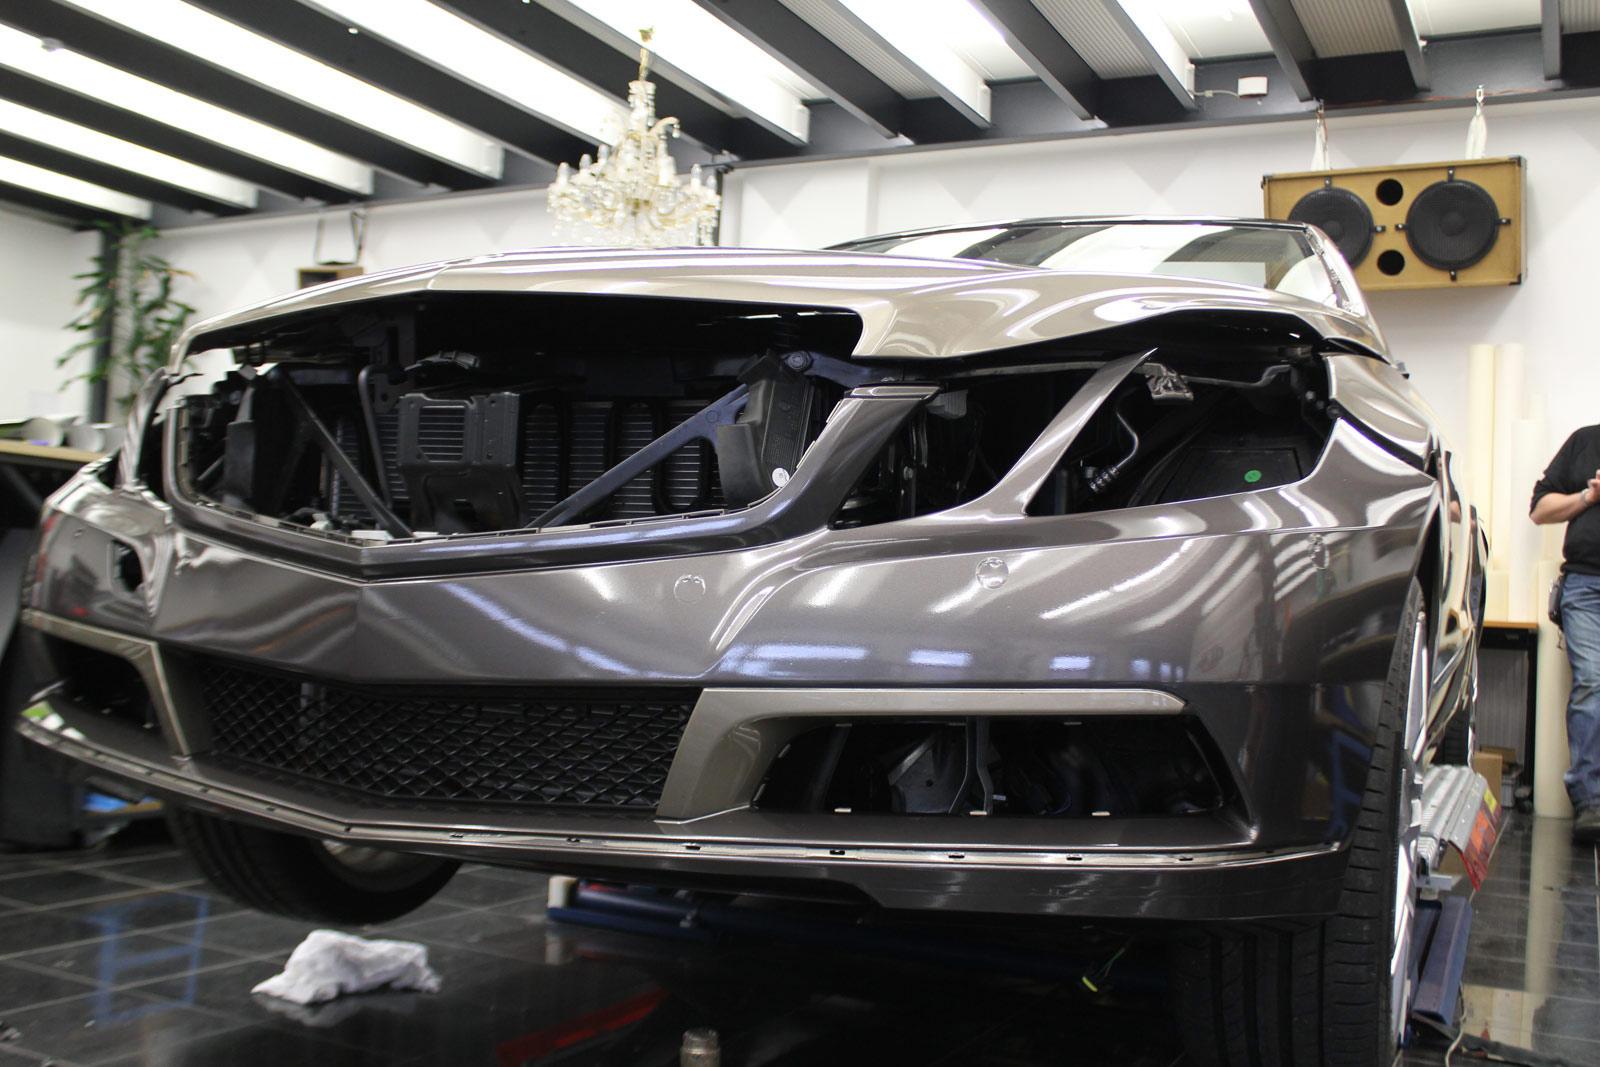 Mercedes_E-Klasse_Cabrio_Folierung_Stannitgrau_Metallic_Glanz_07